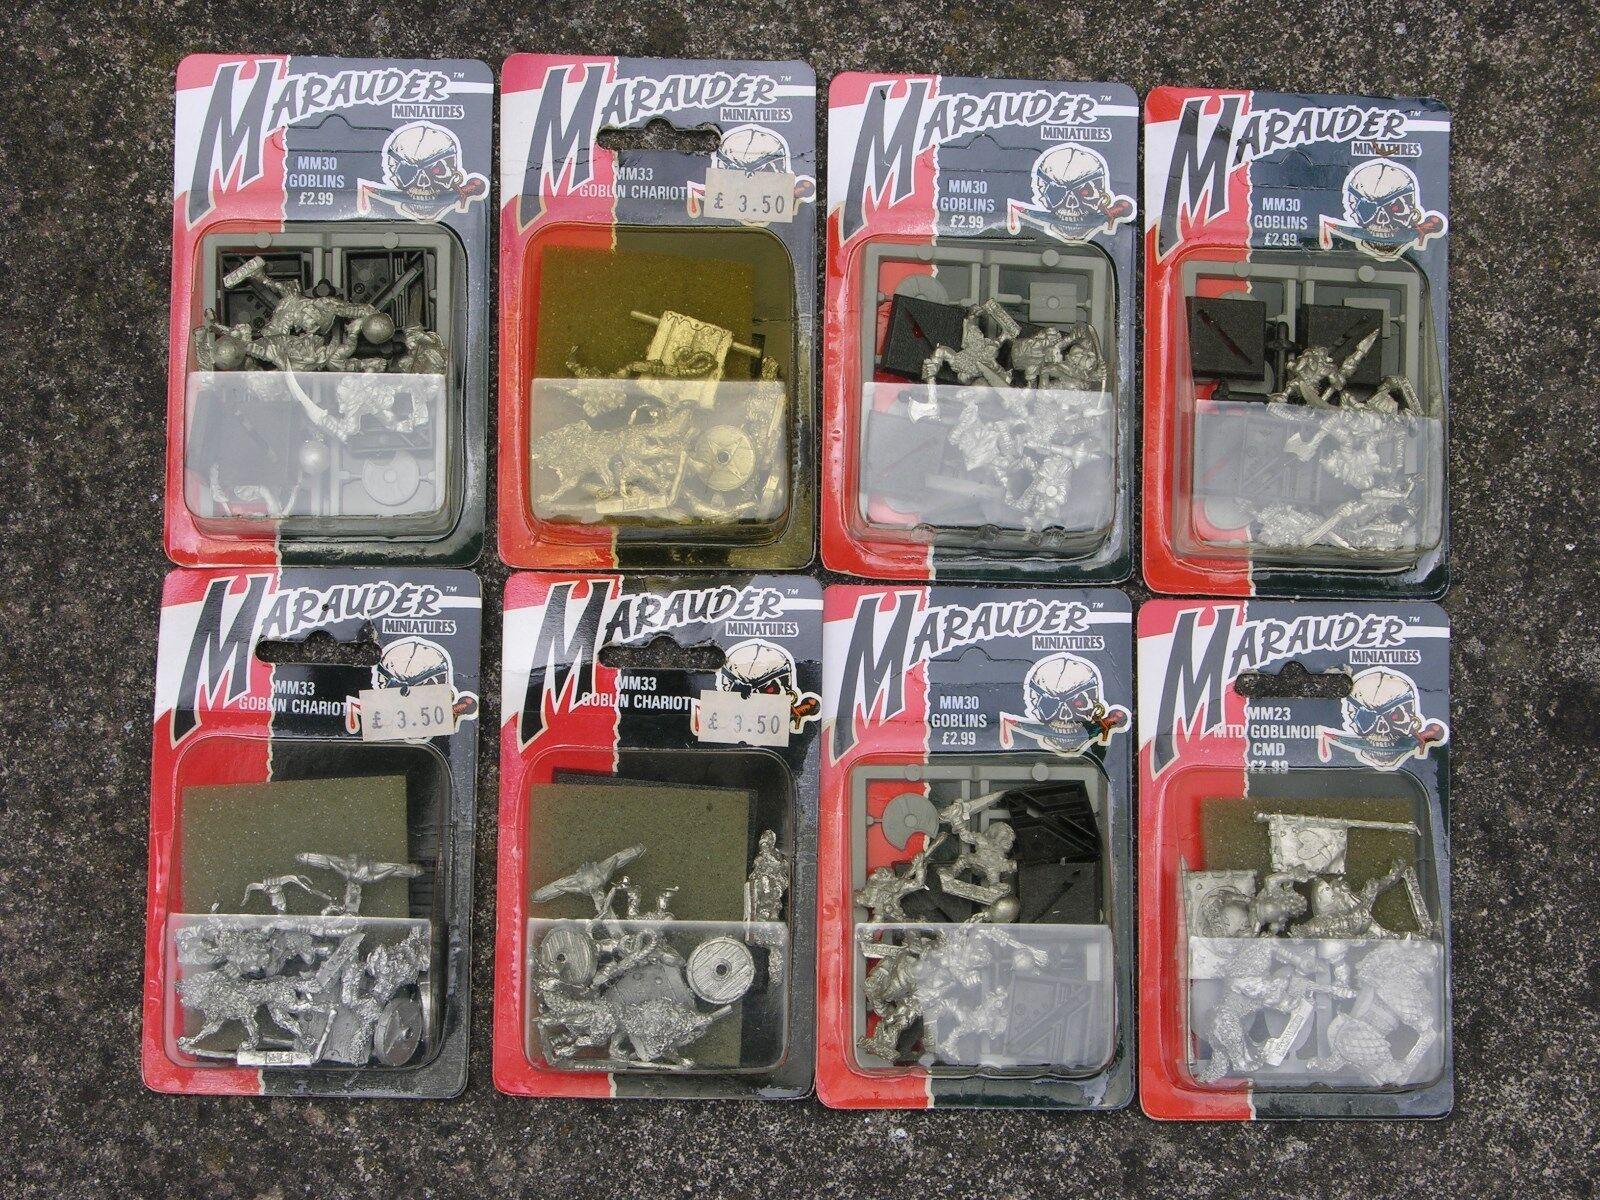 Marauder, Whfb Goblin,   mm  Serie, Paquete Plastificado Listado Múltiple